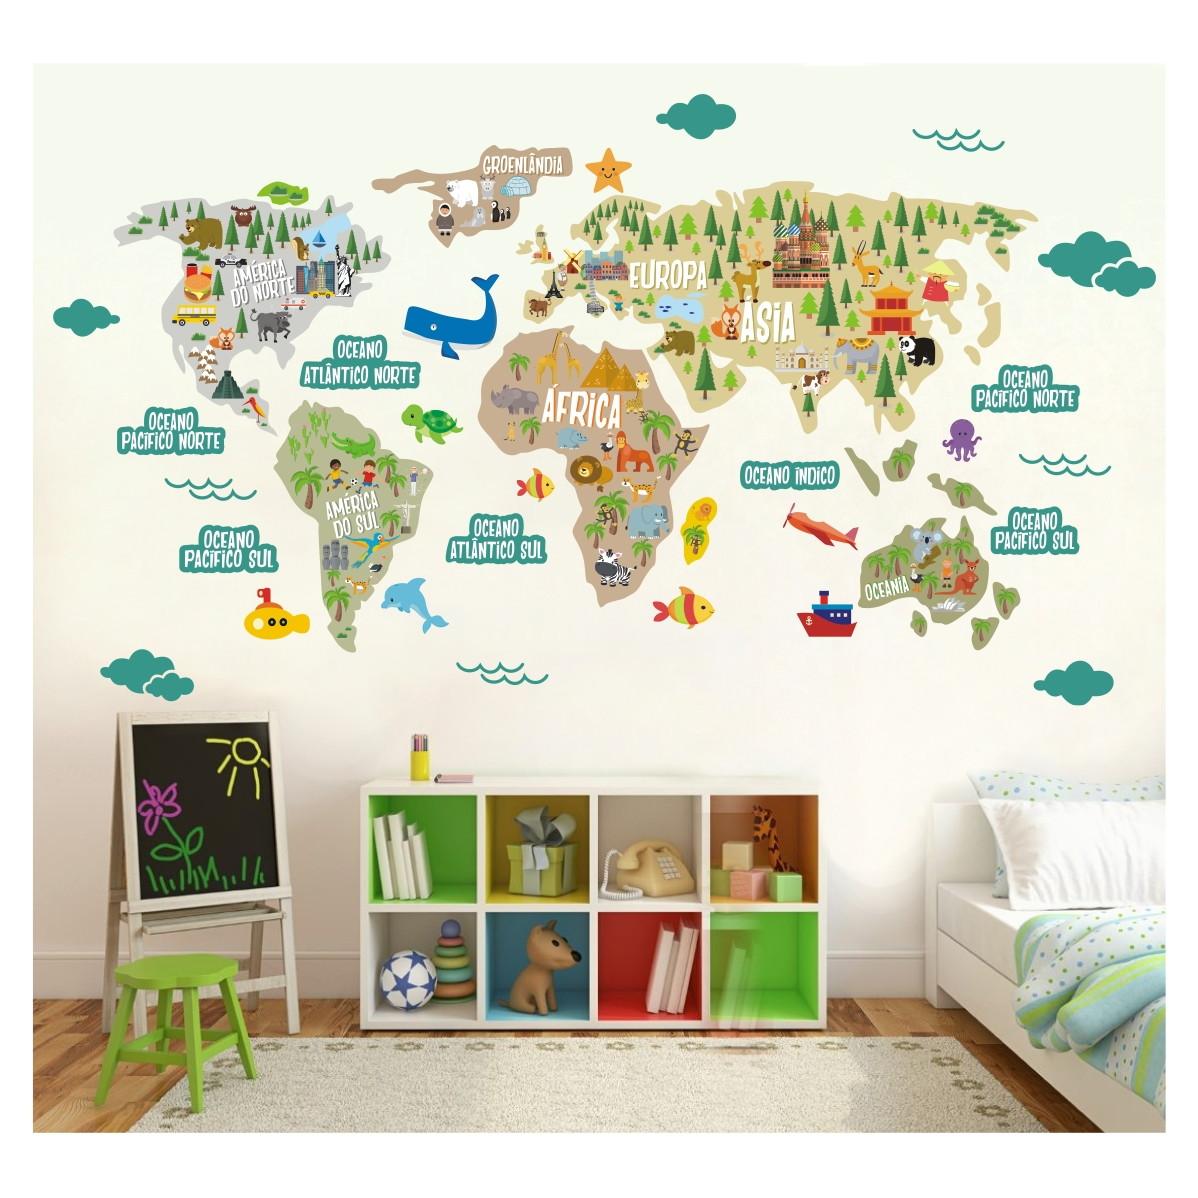 Adesivo Mapa Mundi Infantil Recorte M11  QuartinhoDecorado  Elo7